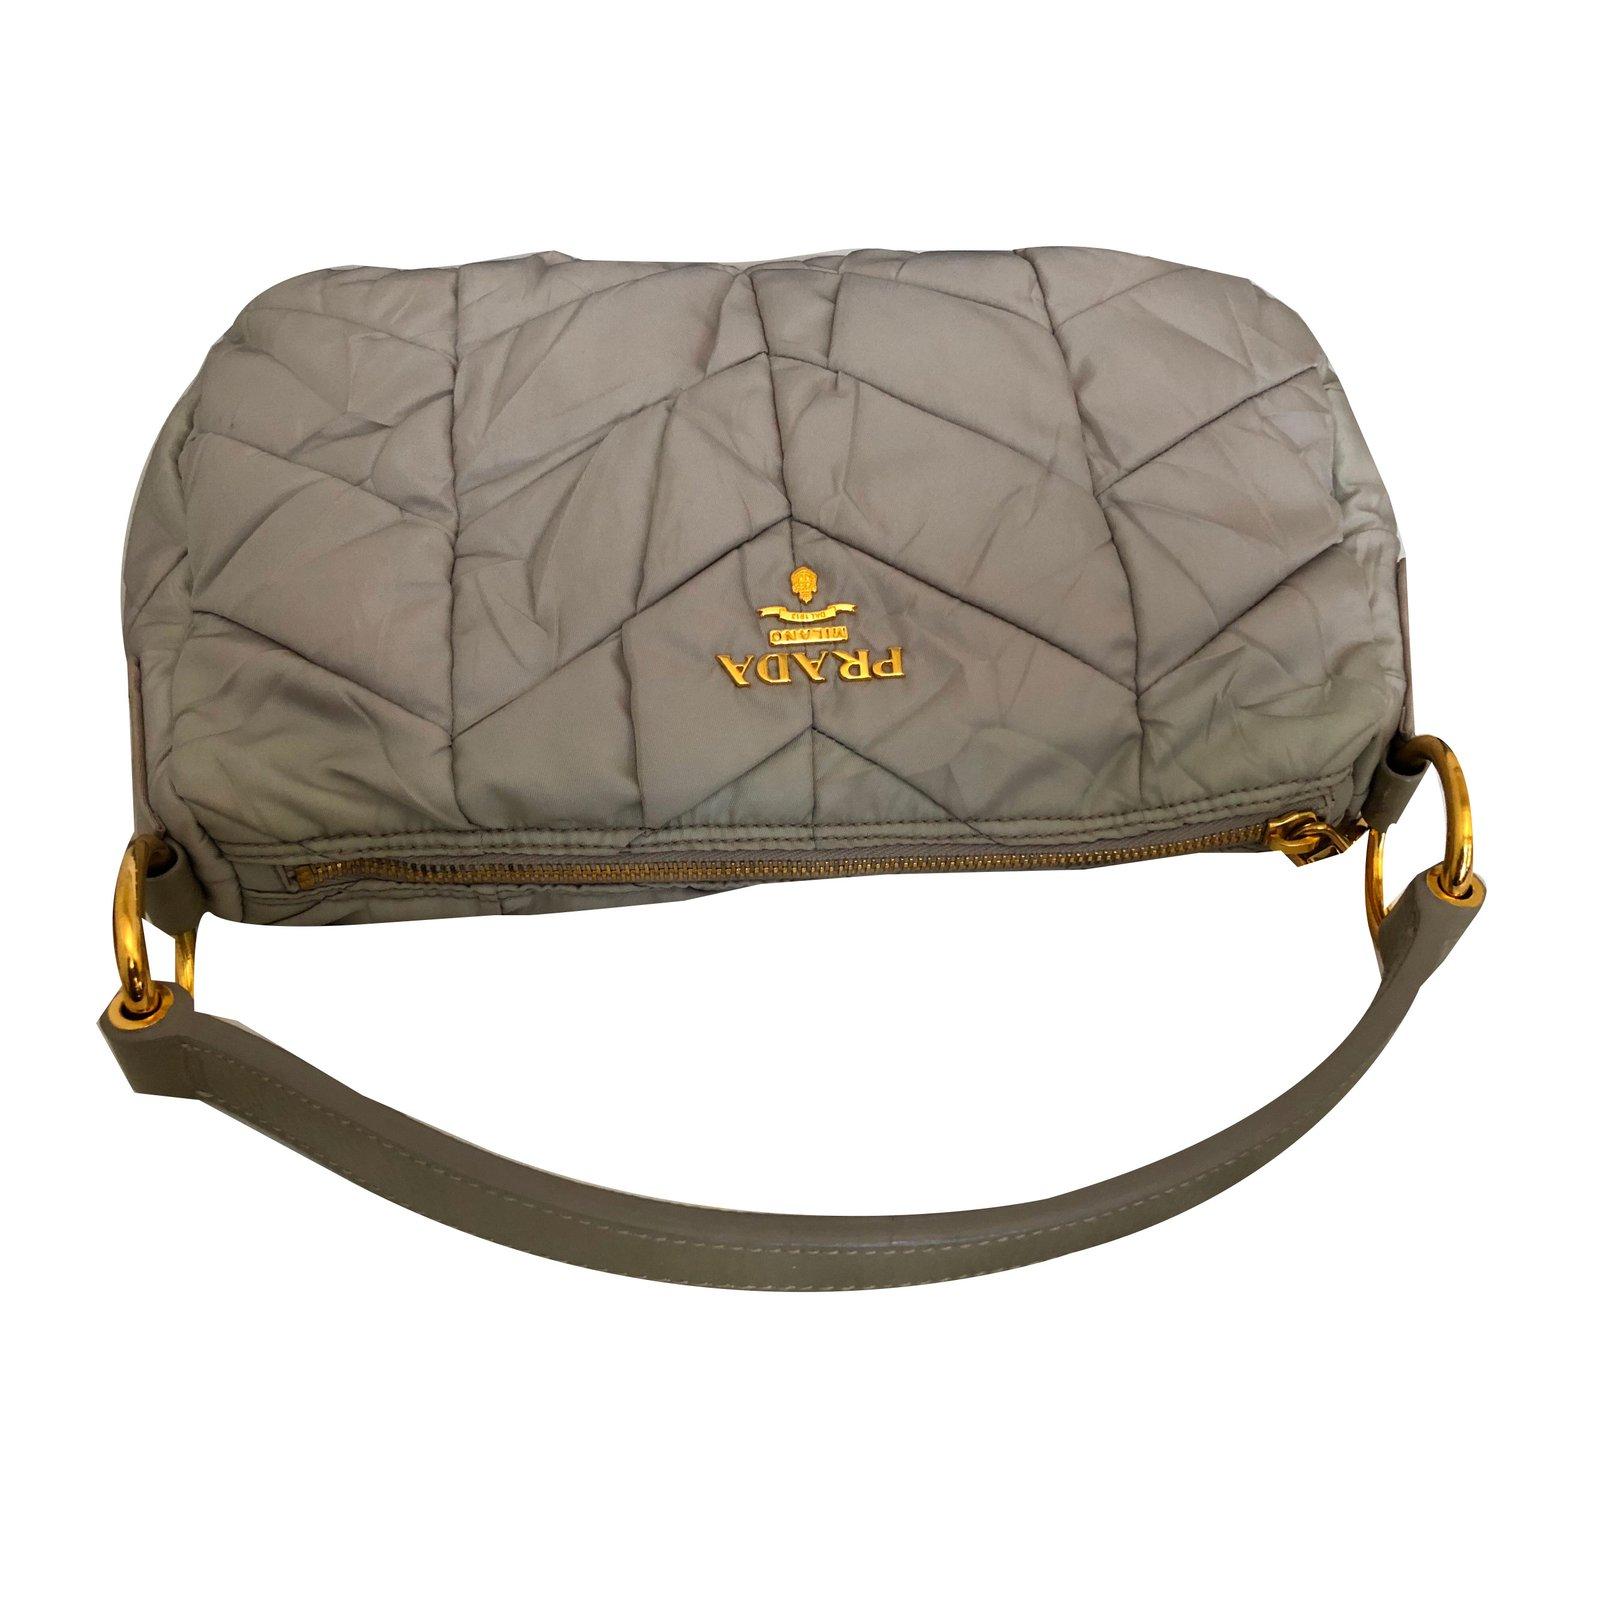 da8a9f044c42 ... clearance prada bag handbags patent leather taupe ref.74291 joli closet  18bfb dc3cd